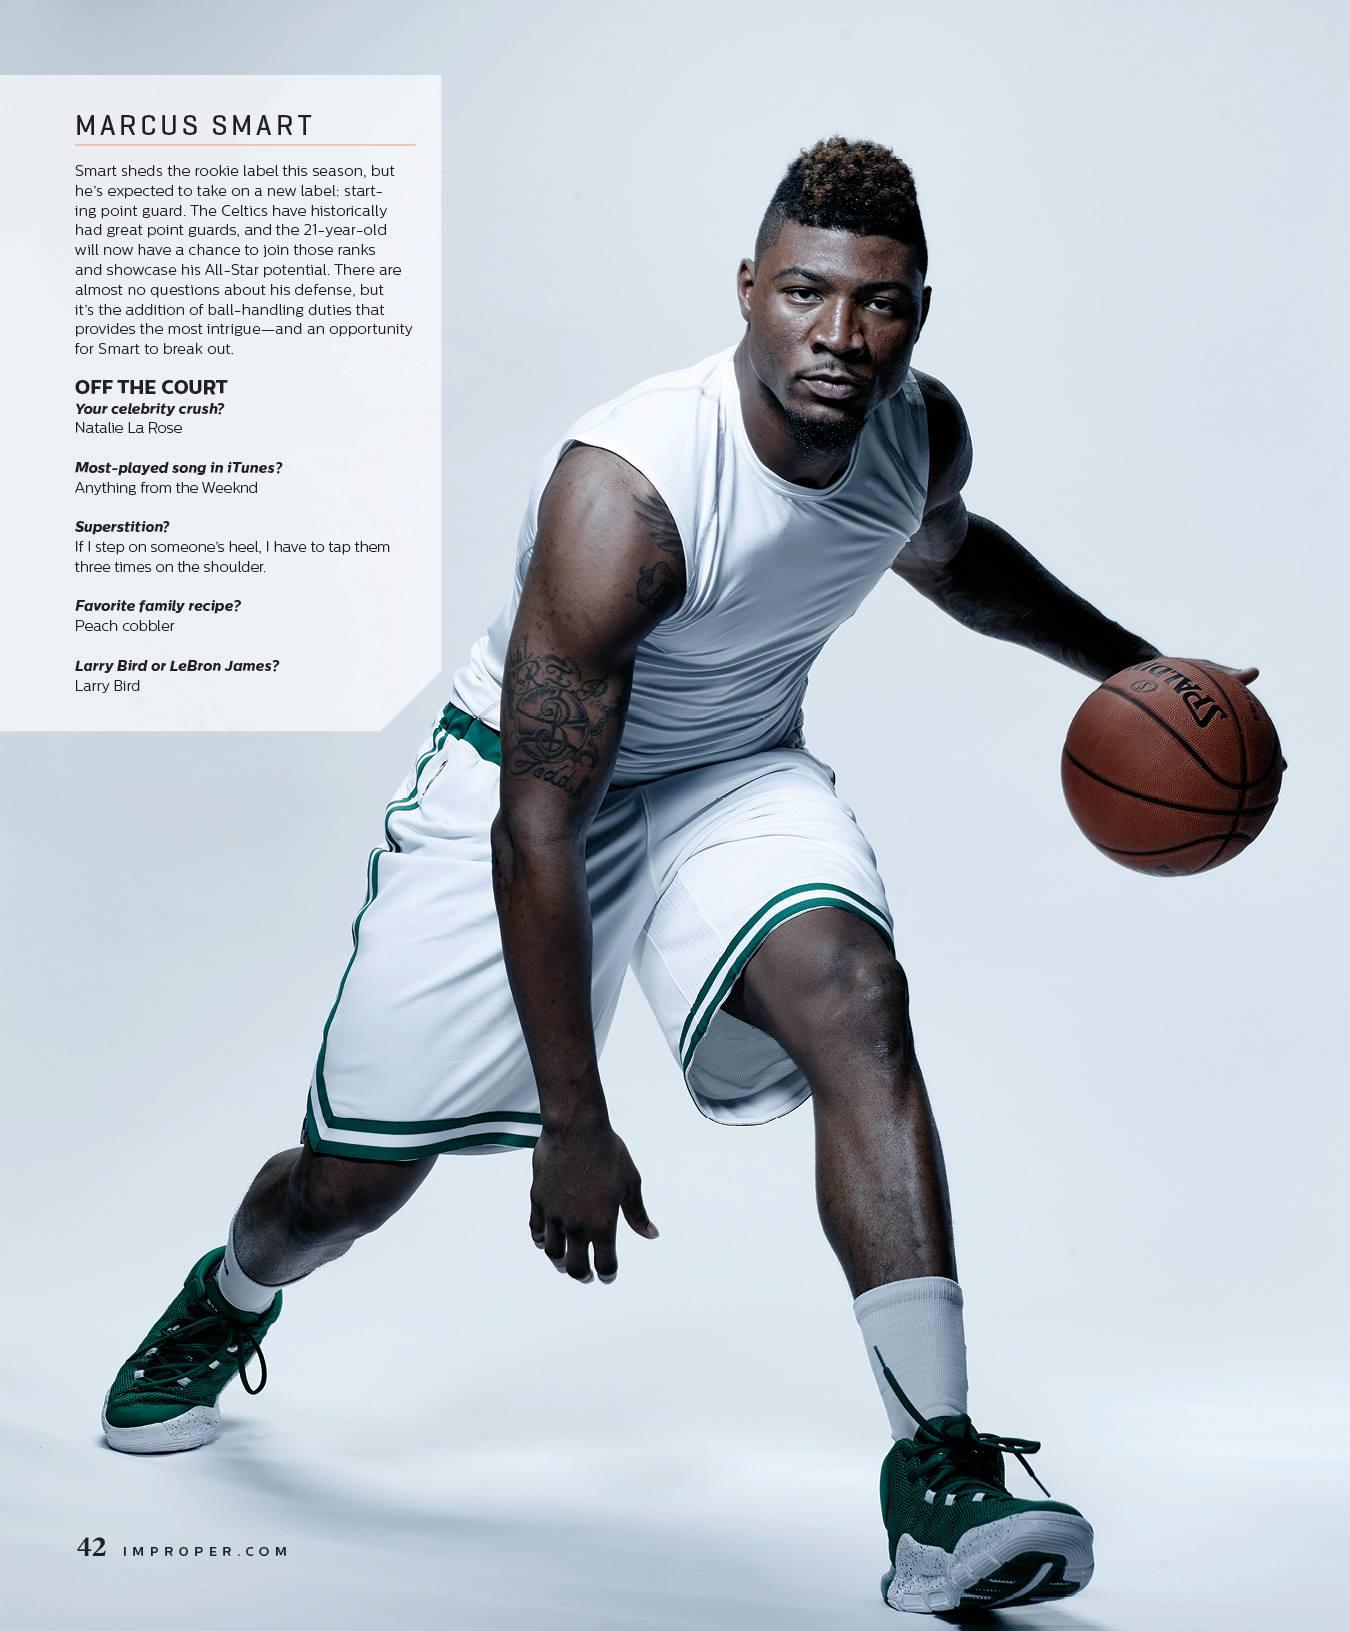 Marcus-Smart-Celtics